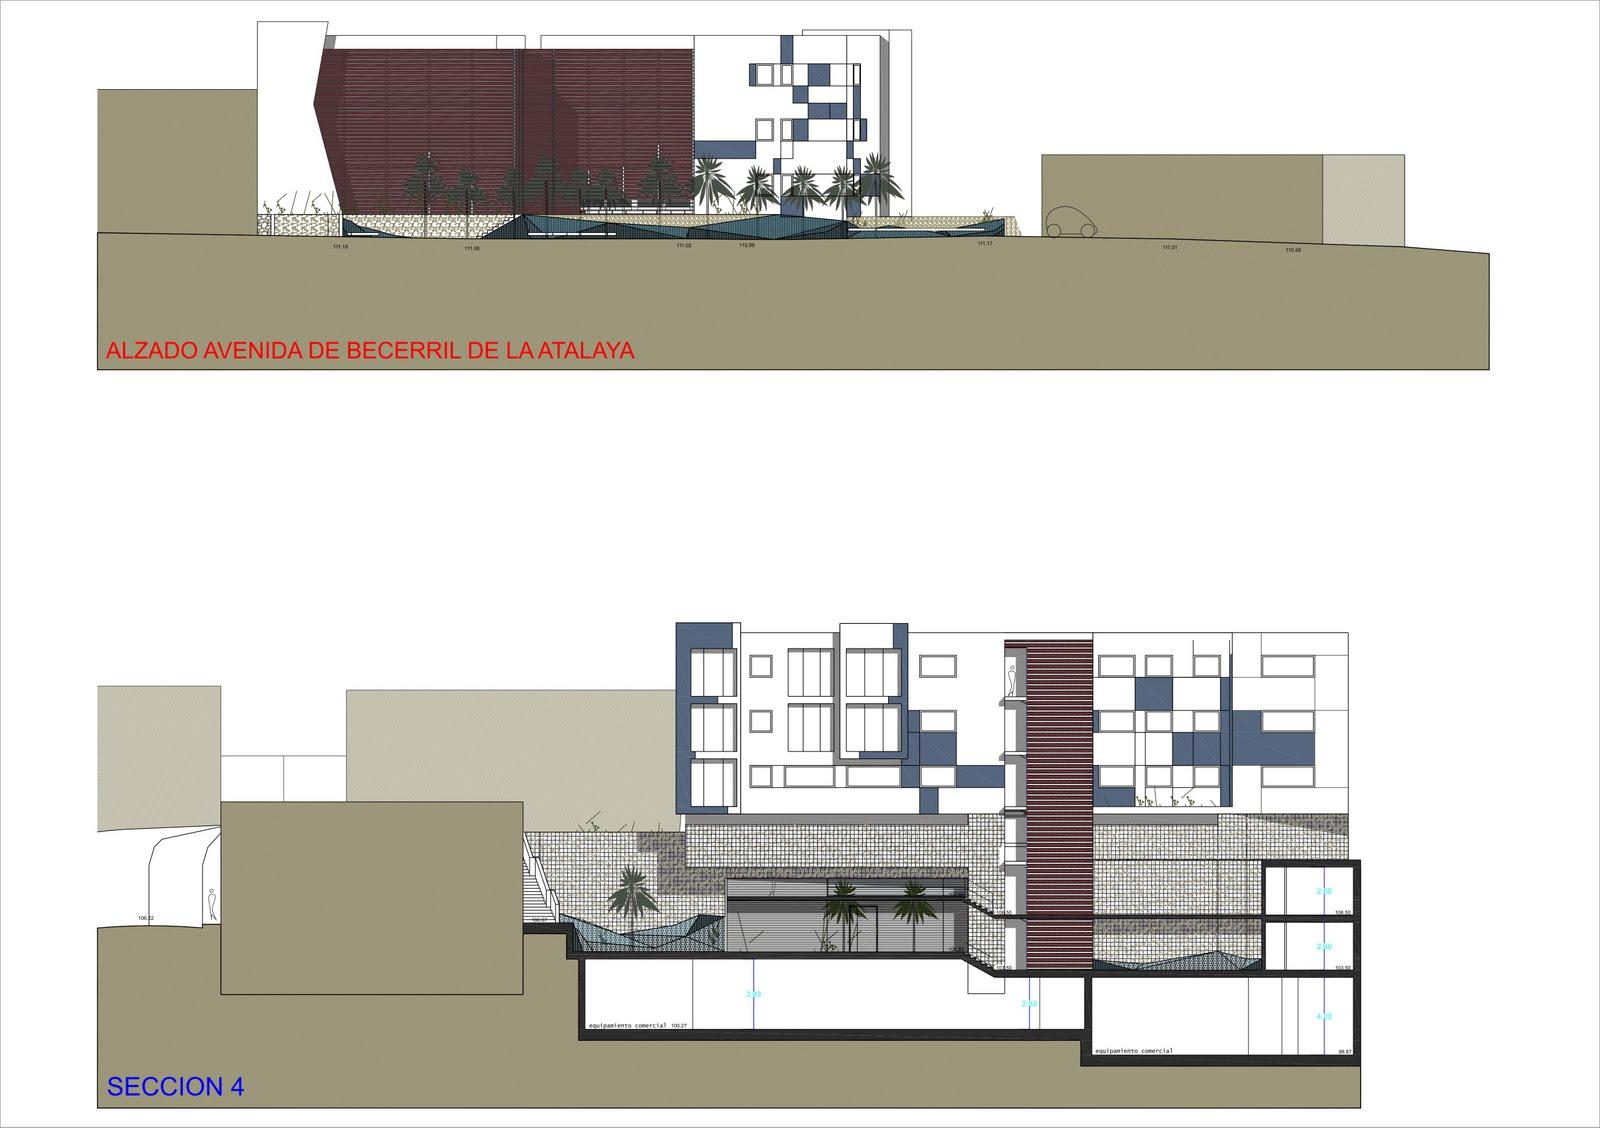 Quirina morales rojas arquitectura y dise o 2006 gva - Gva arquitectos ...